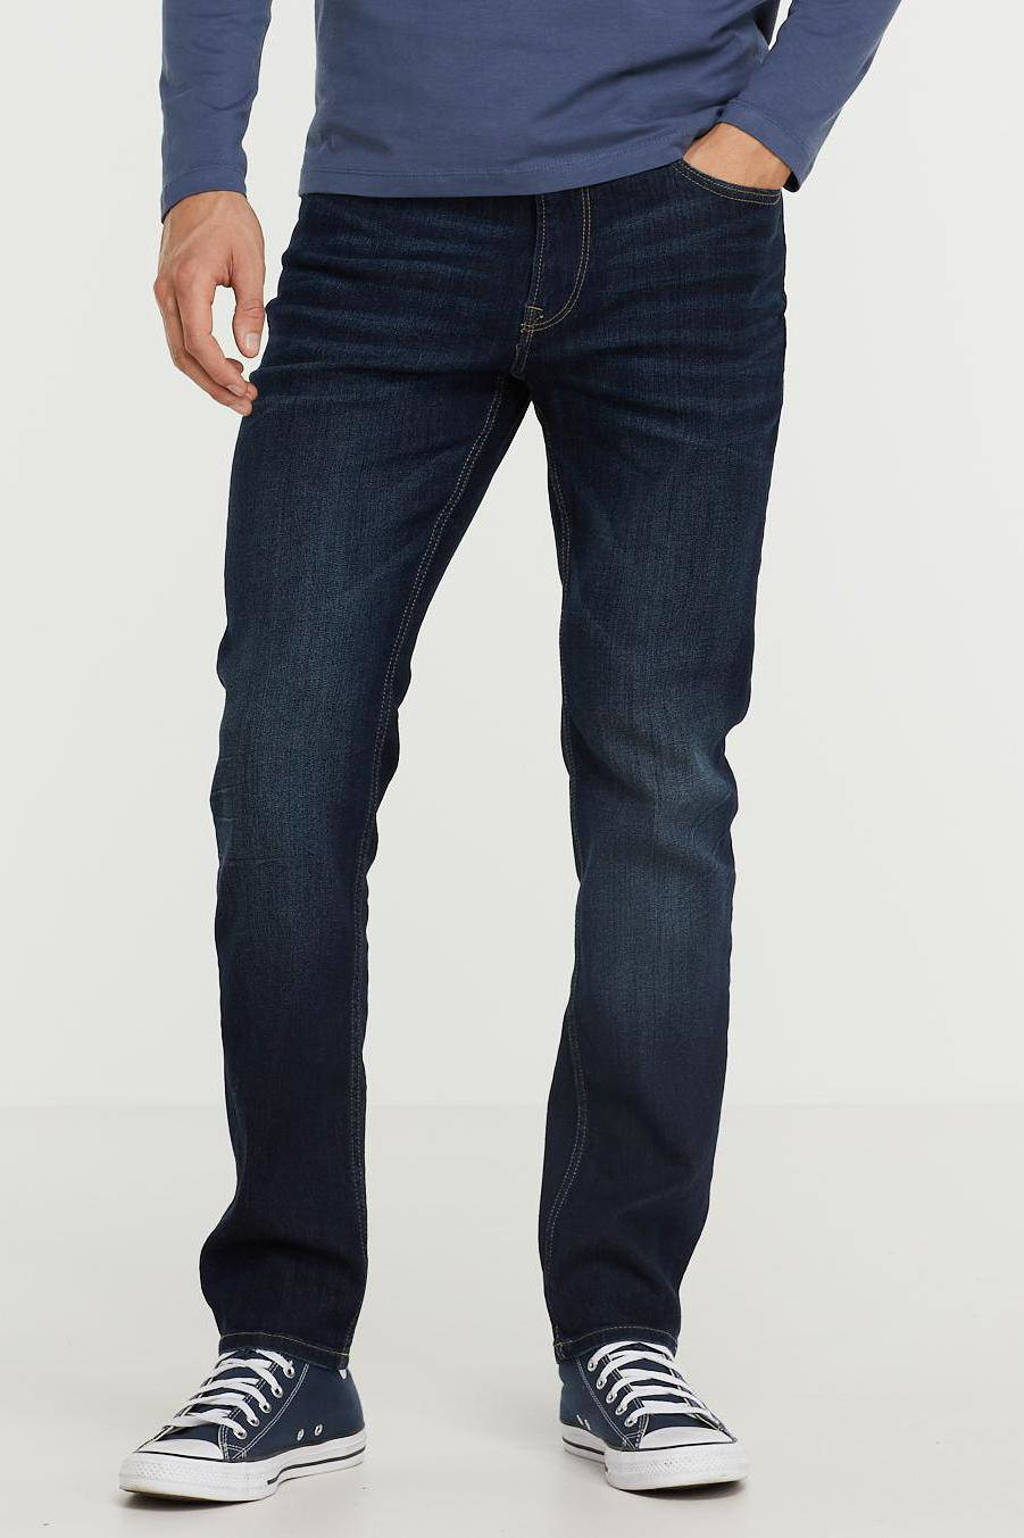 PRODUKT slim fit jeans dark blue denim, Dark blue denim